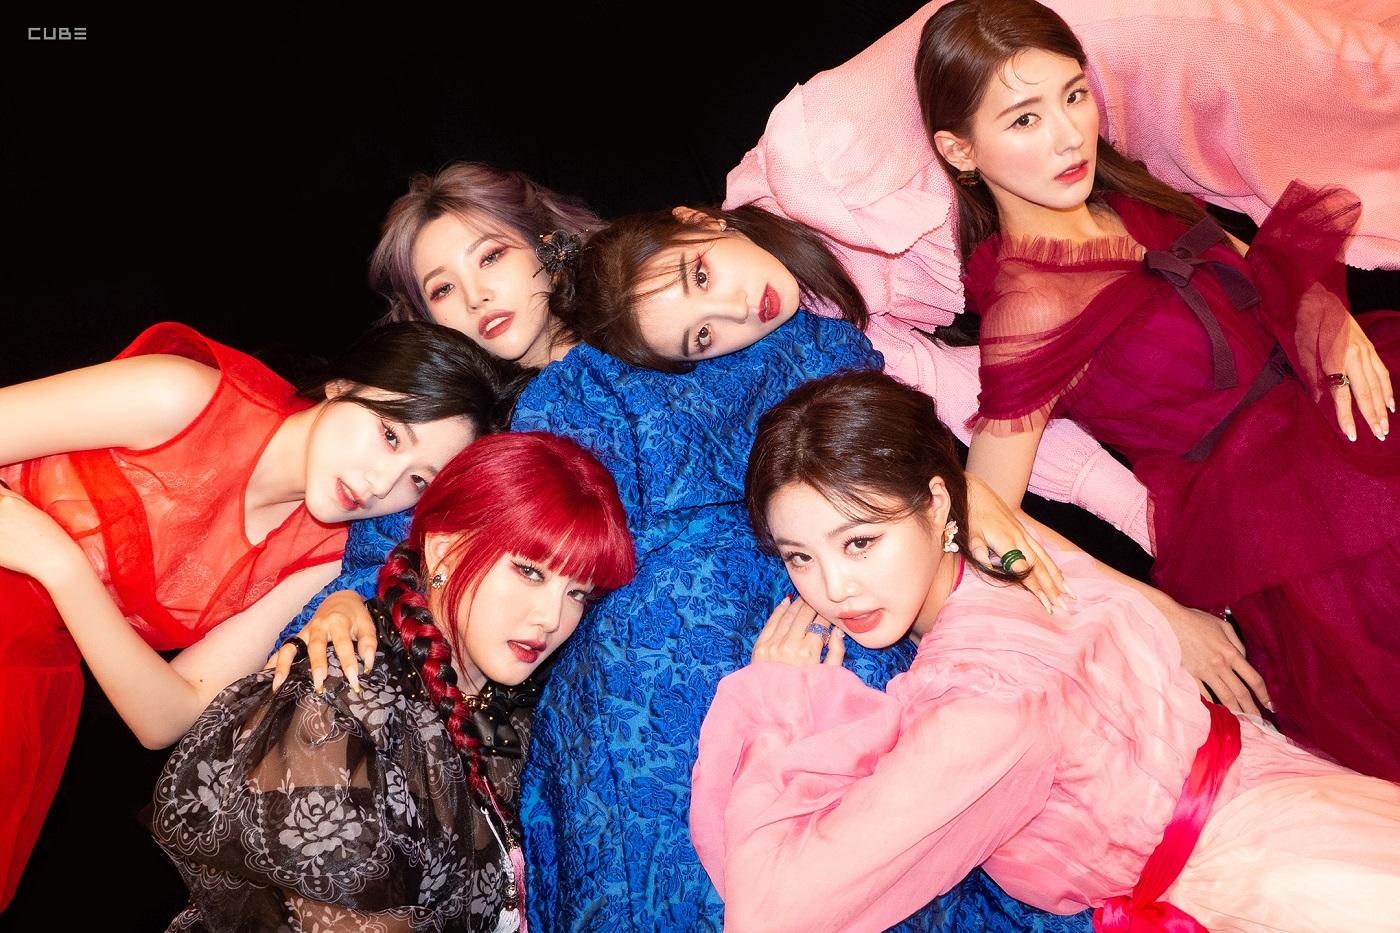 blackpink-gi-dle-mamamoo-top-girl-group-brand-reputation-rankings-in-february-seventeen-top-boy-group-brand-reputation-rankings-in-february